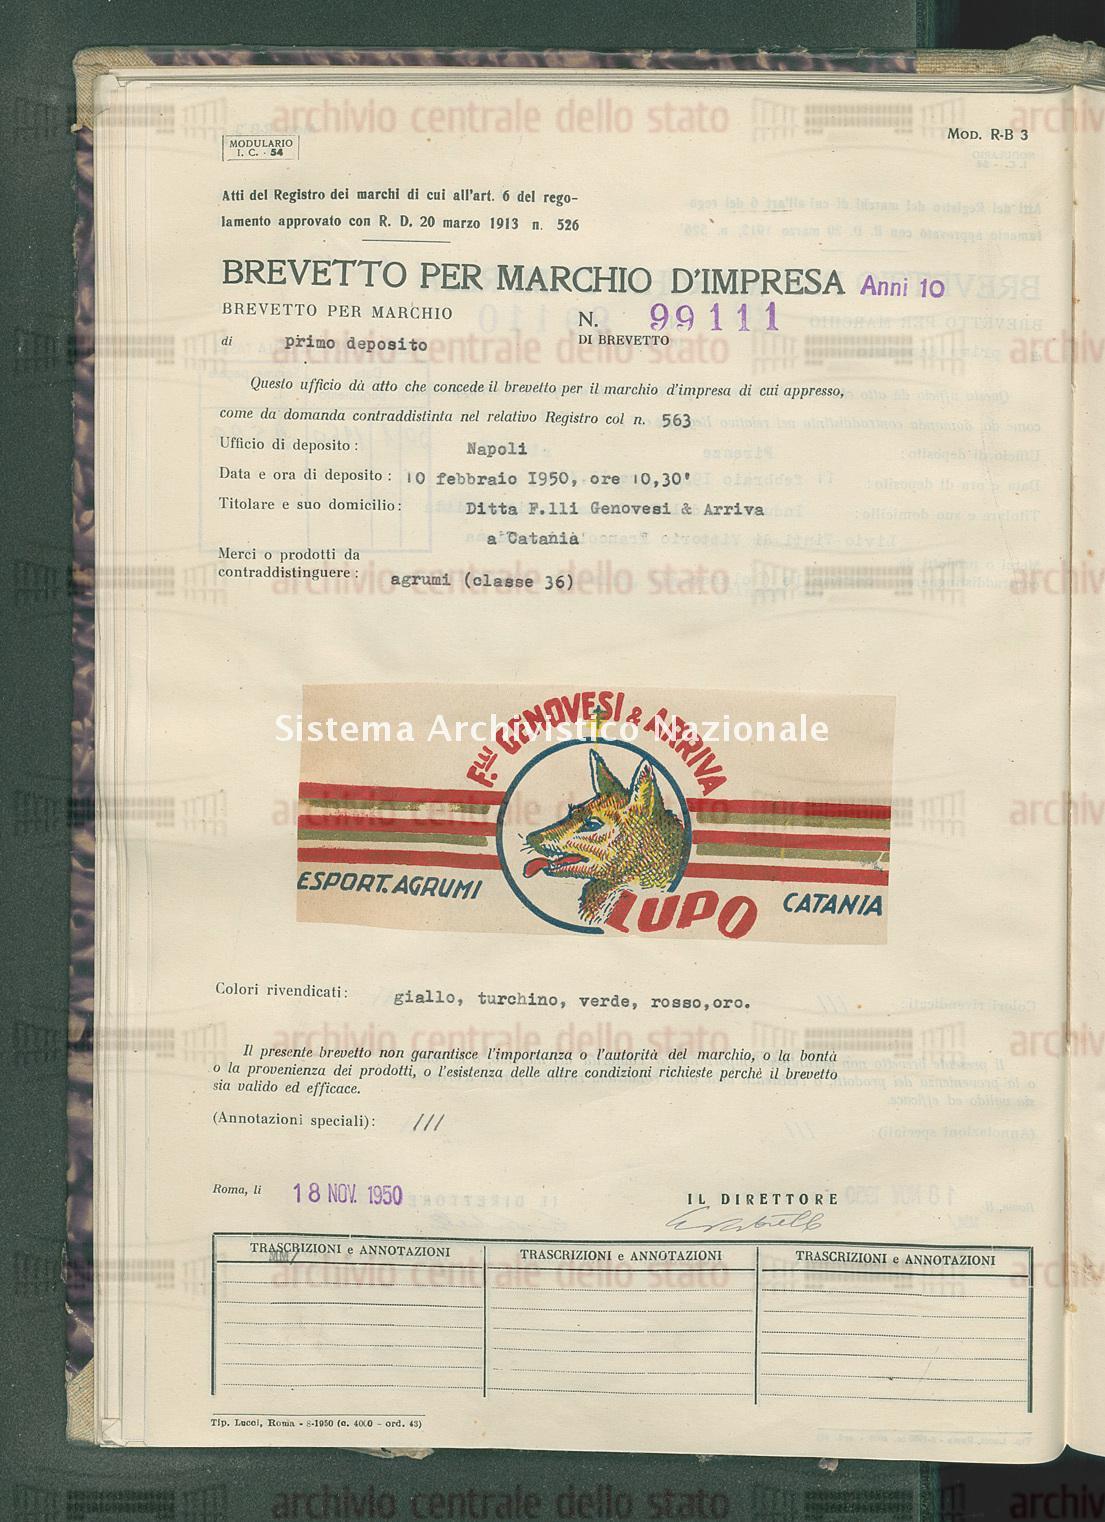 Agrumi Ditta F.Lli Genovesi & Arriva (18/11/1950)